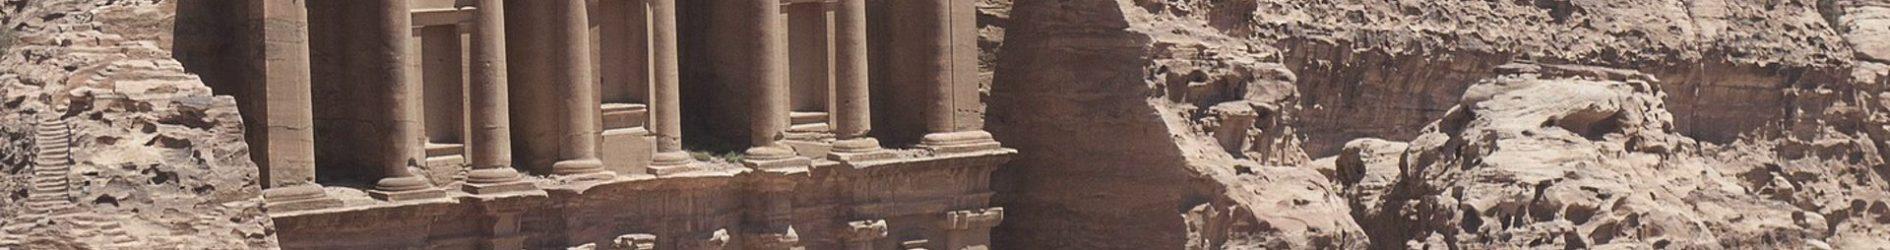 8 – 18 mei – rondreis Jordanie